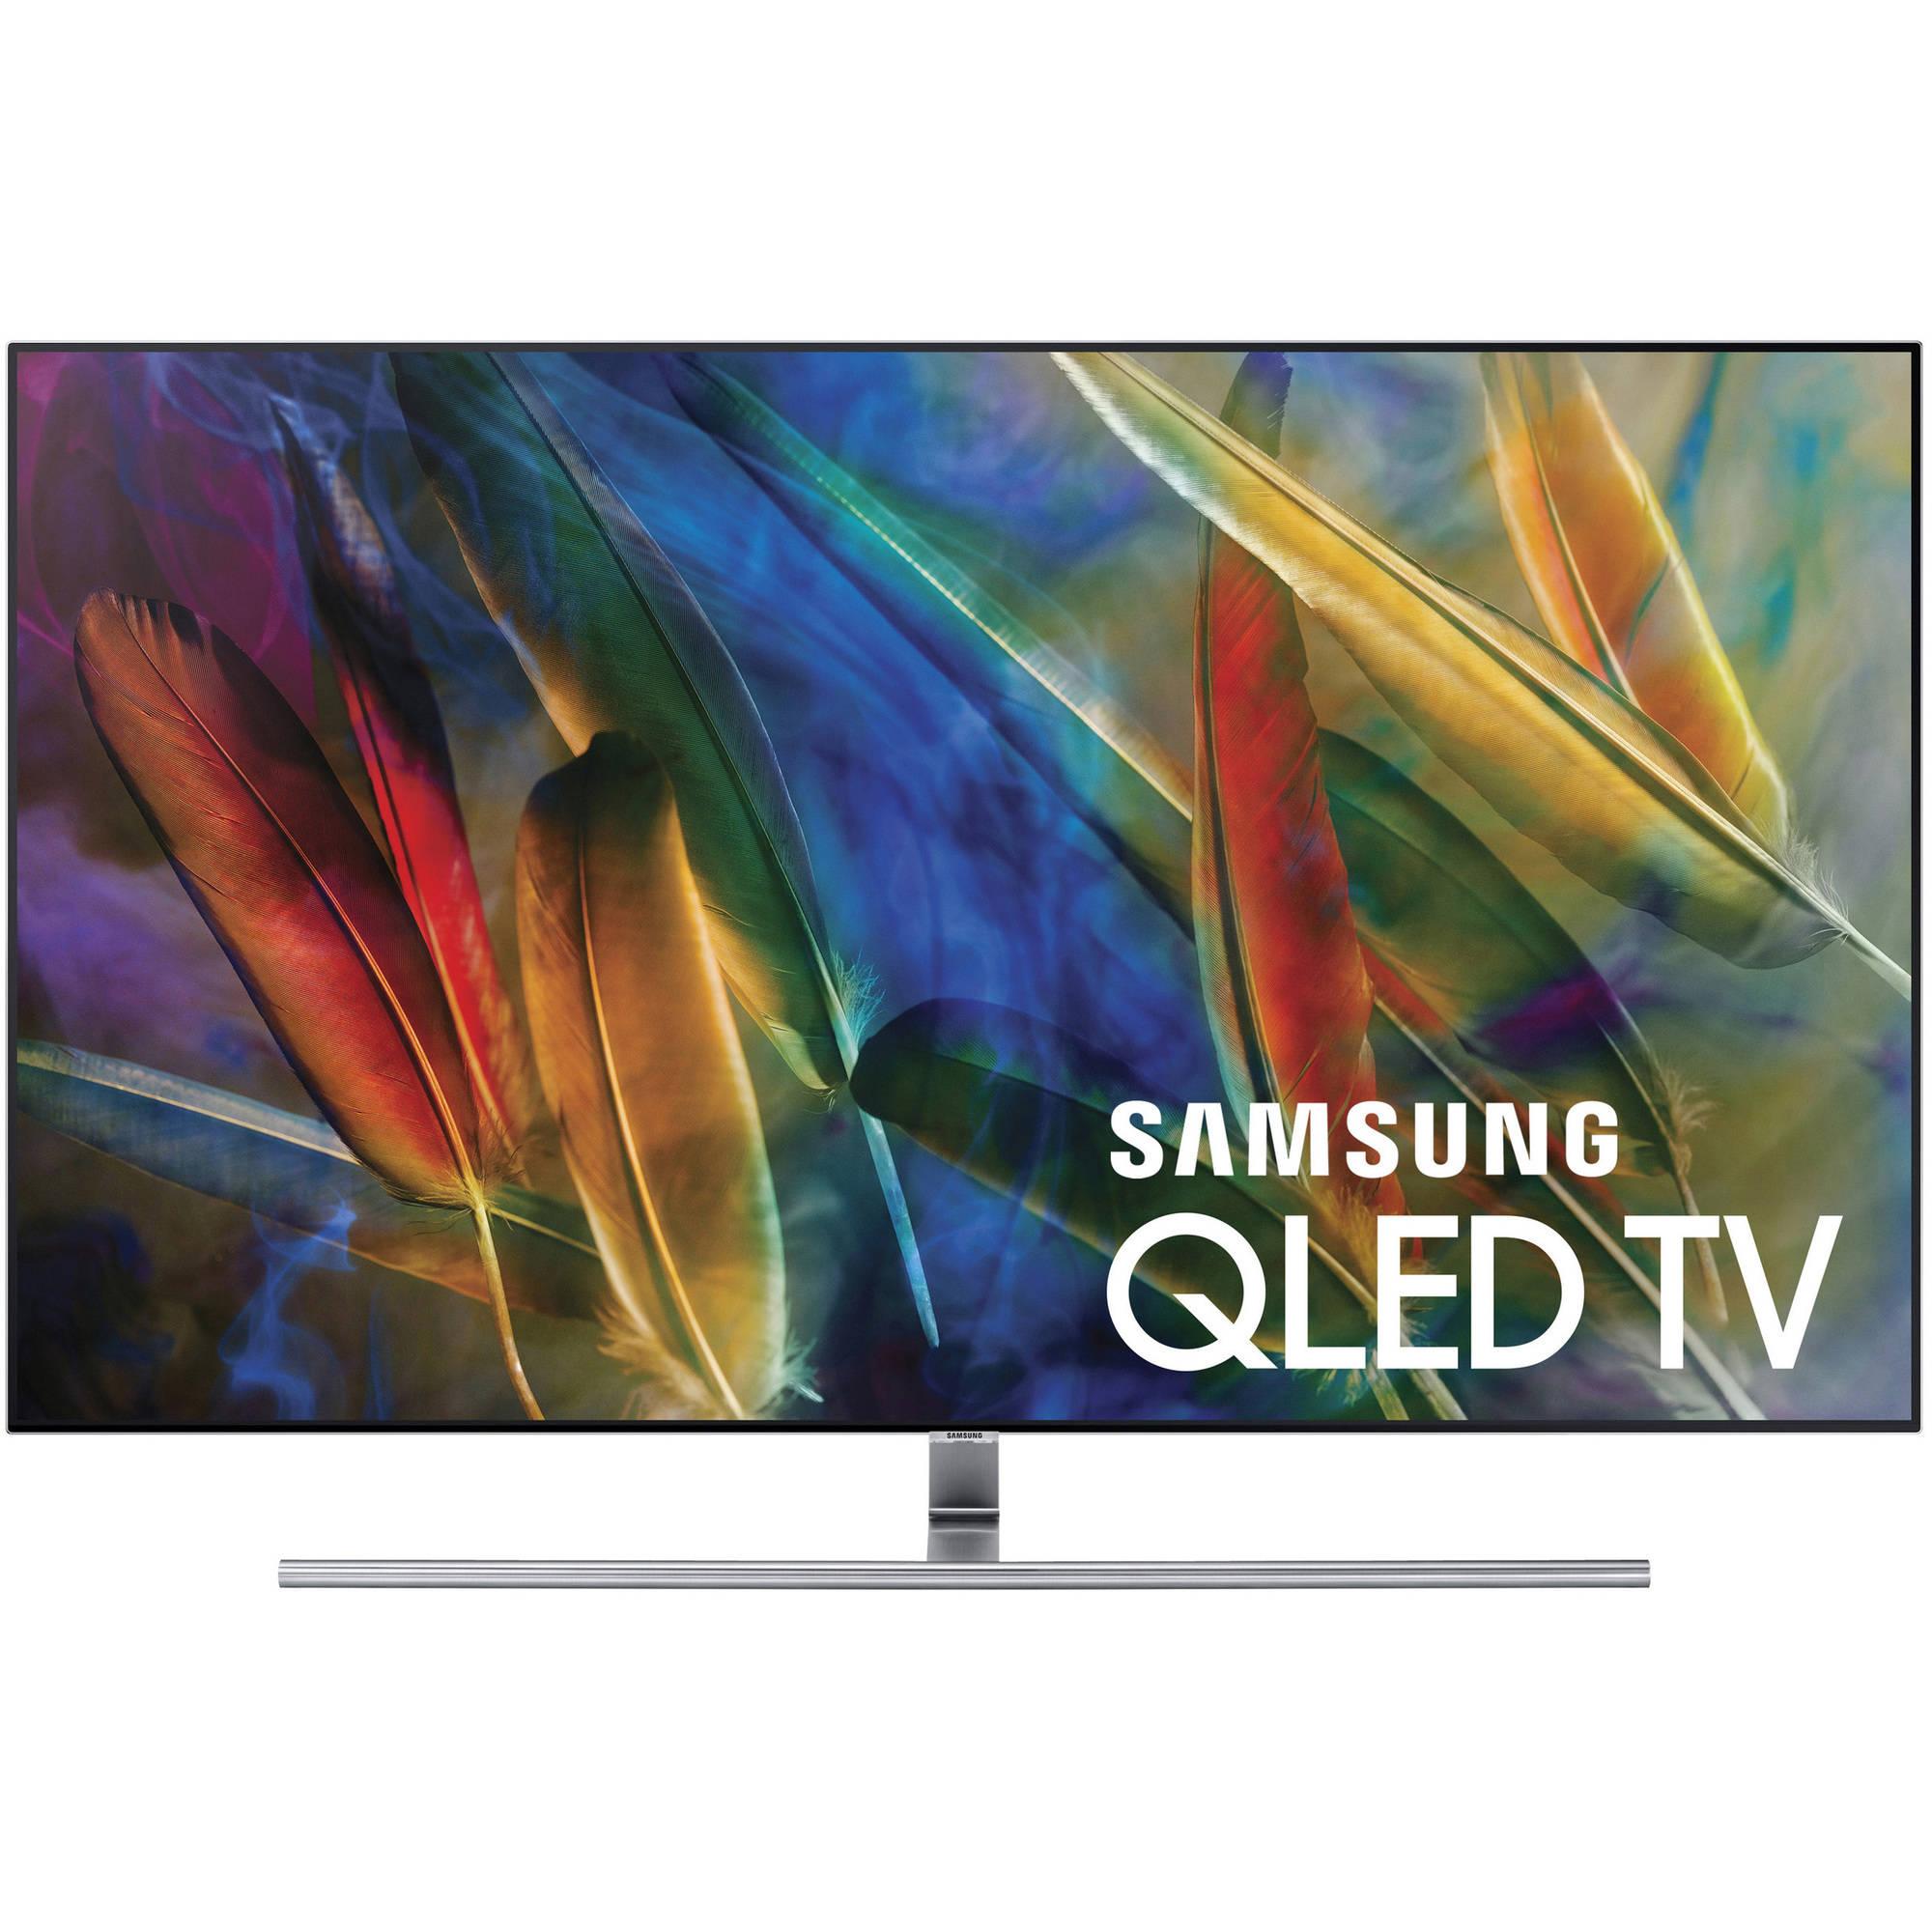 "Refurbished Samsung 55"" Class 4k (2160P) Smart QLED TV (QN55Q7FAMFXZA)"